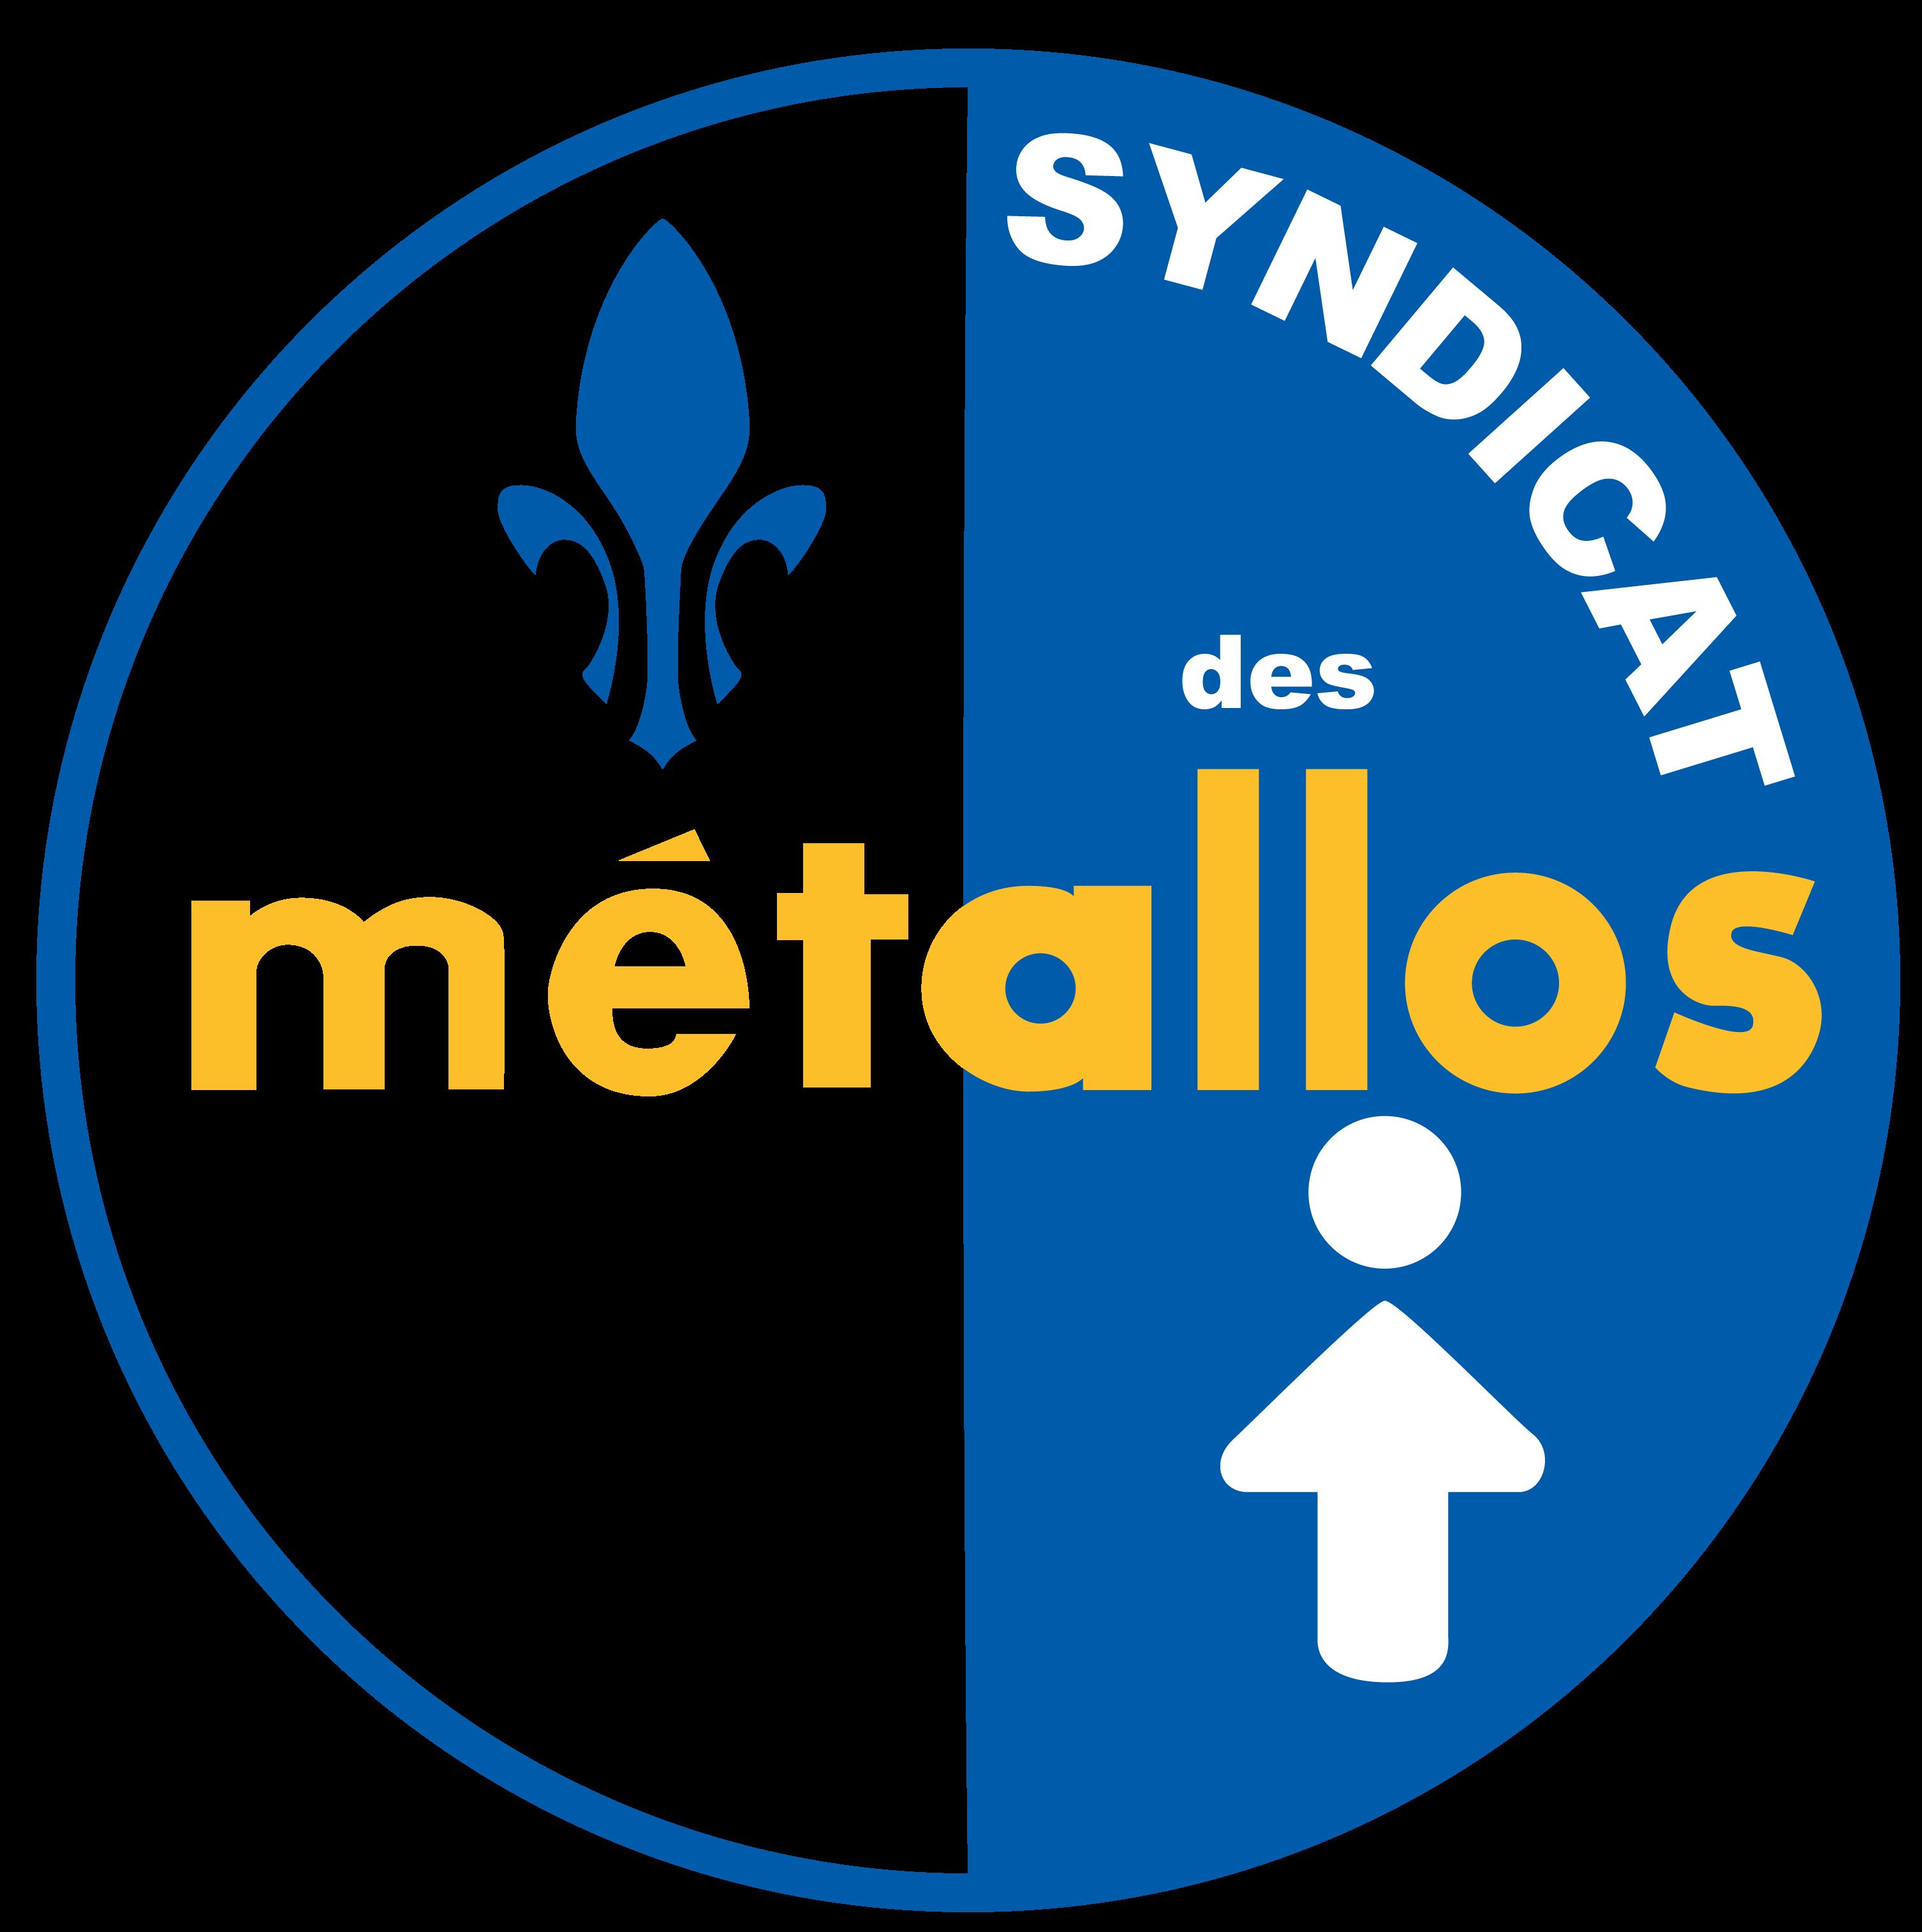 metallos